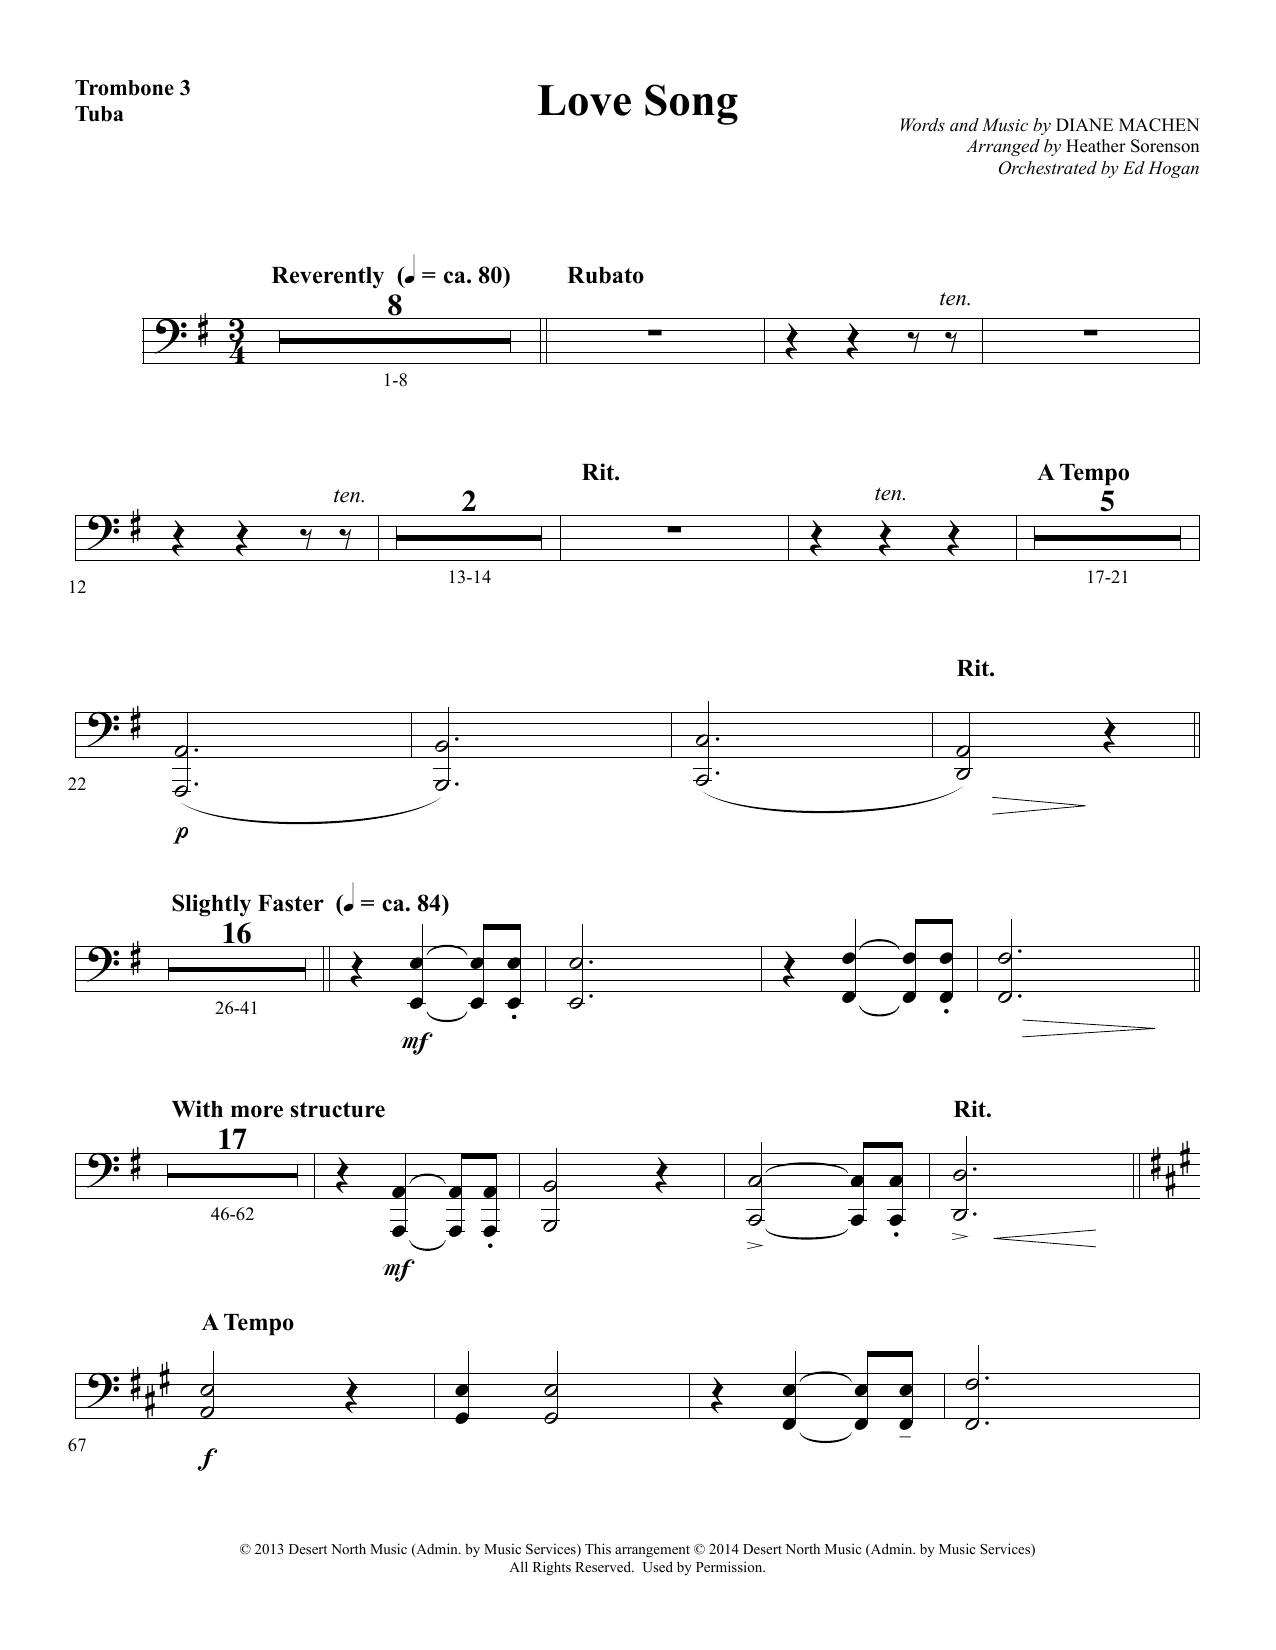 Love Song - Trombone 3/Tuba sheet music